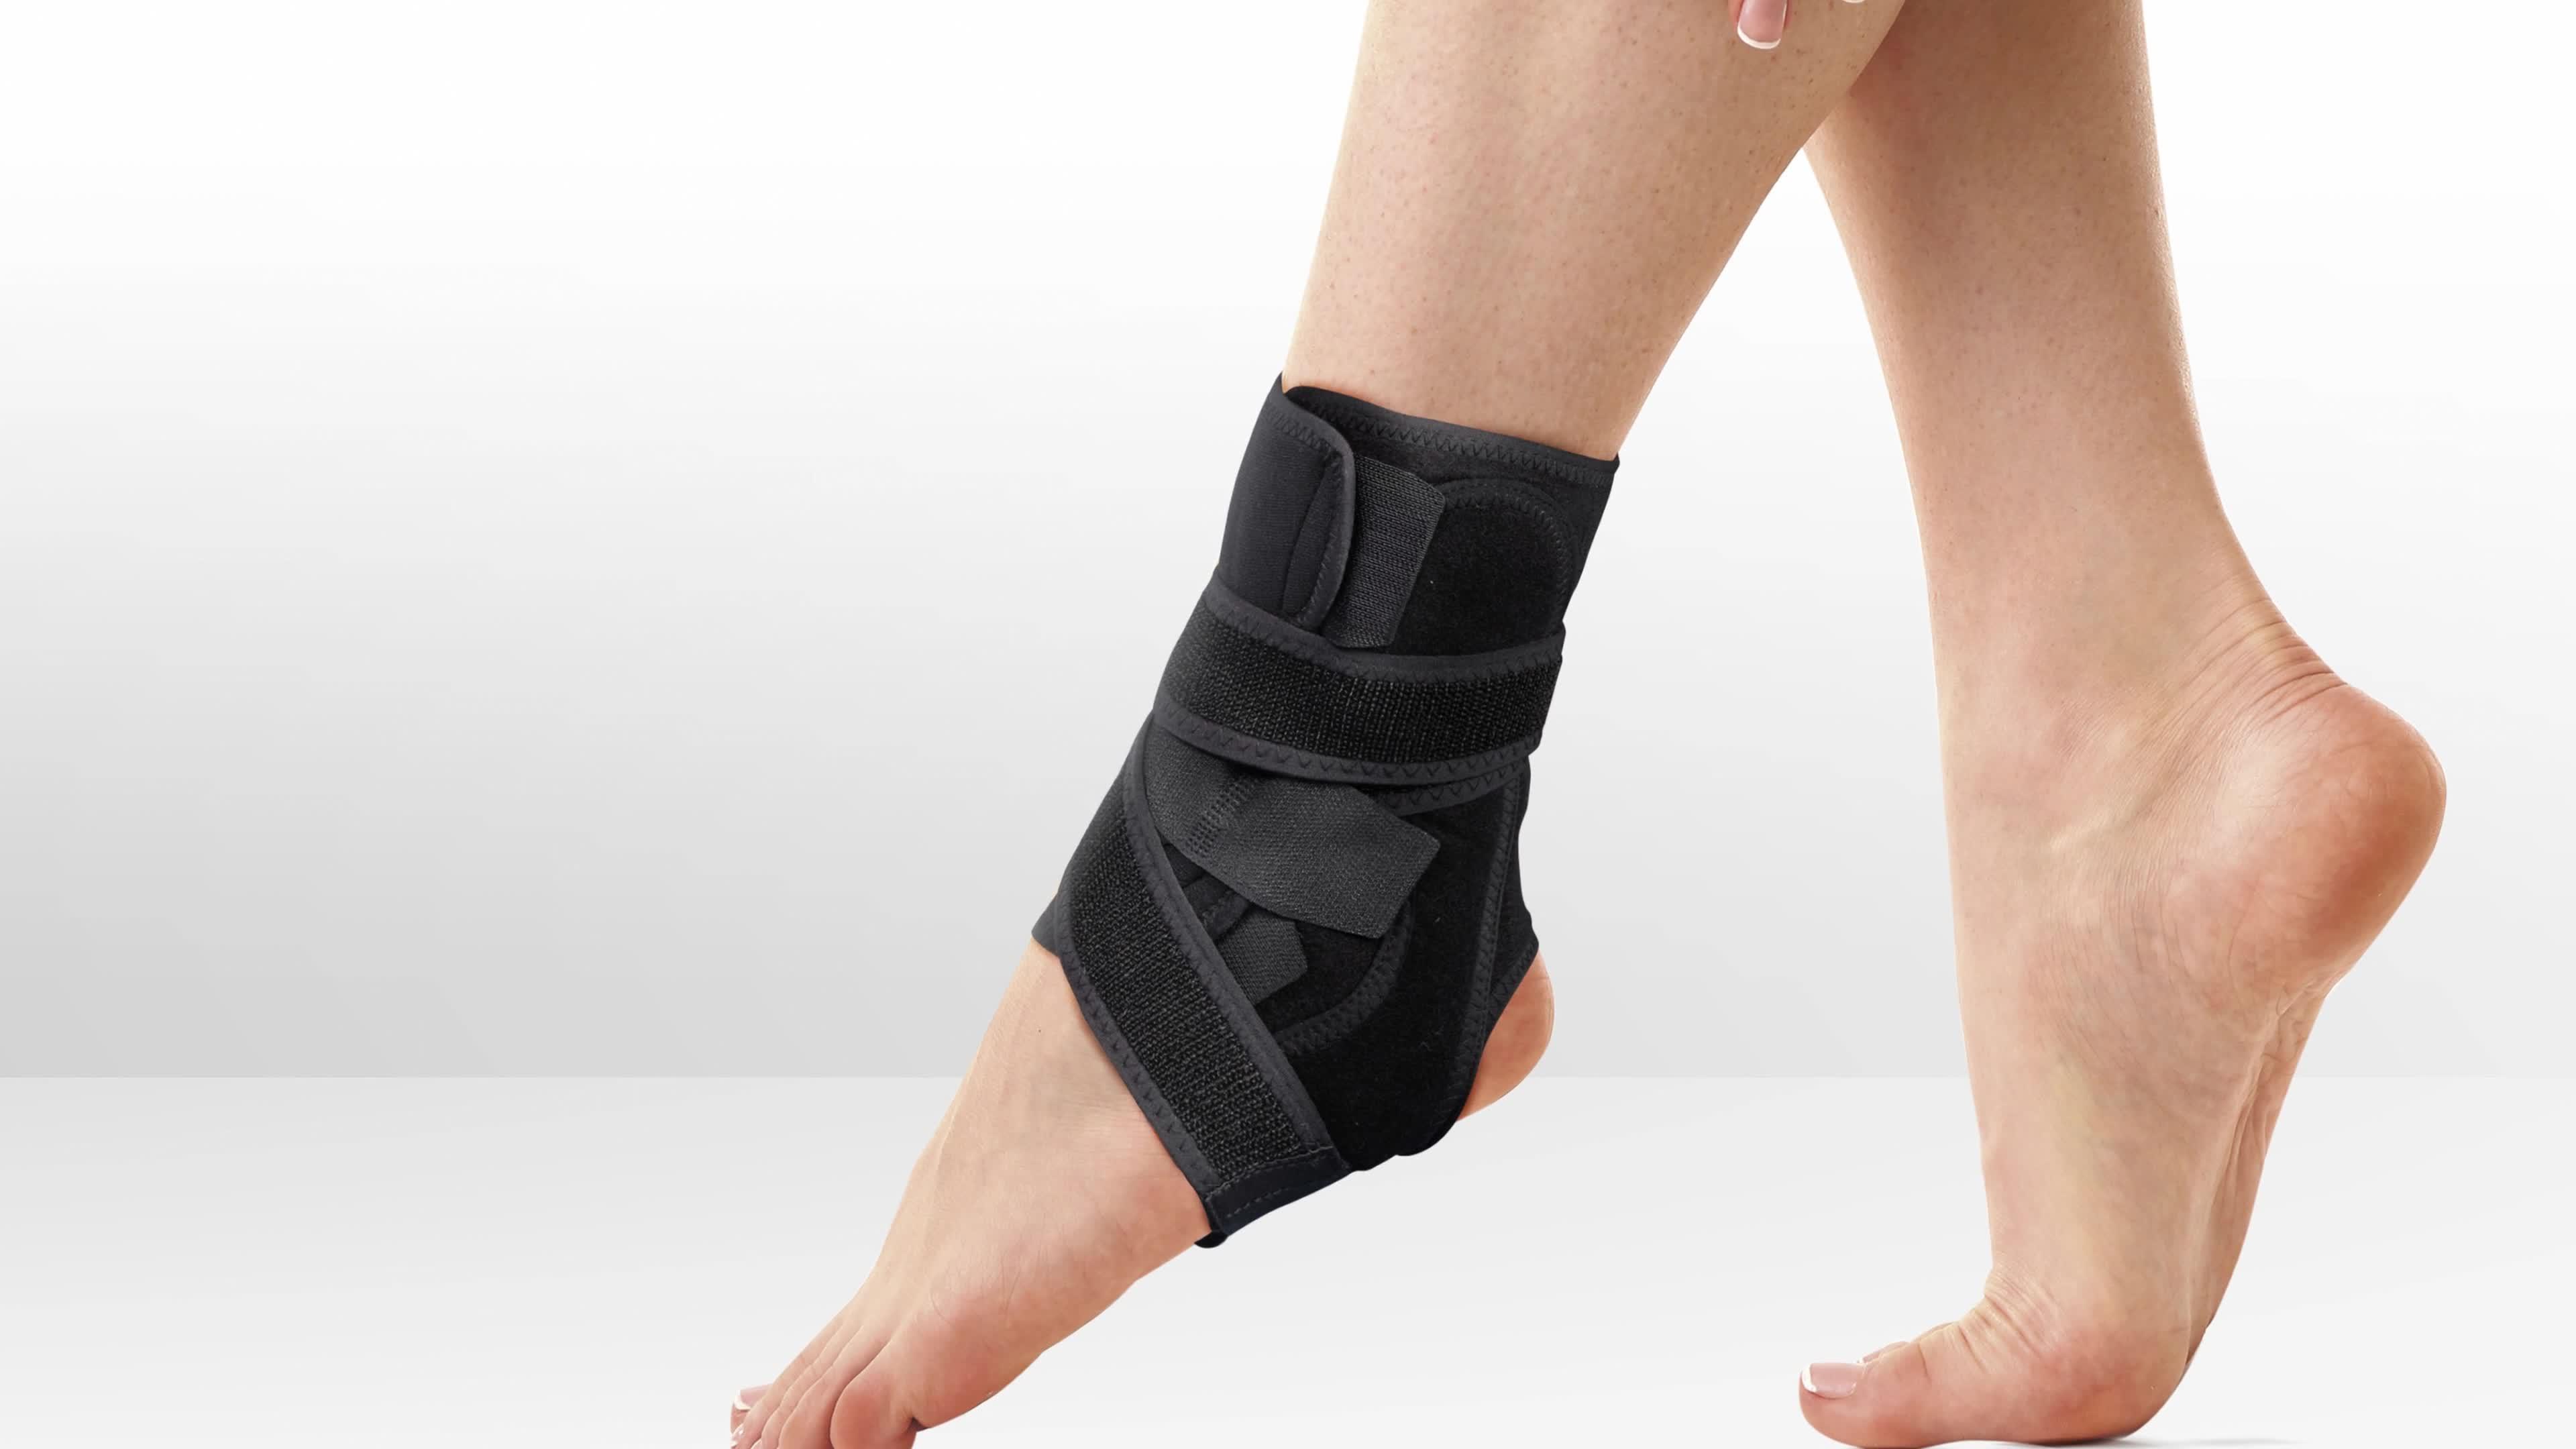 Uchee Neoprene Ankle Brace suporte de tornozelo neoprene para fitness